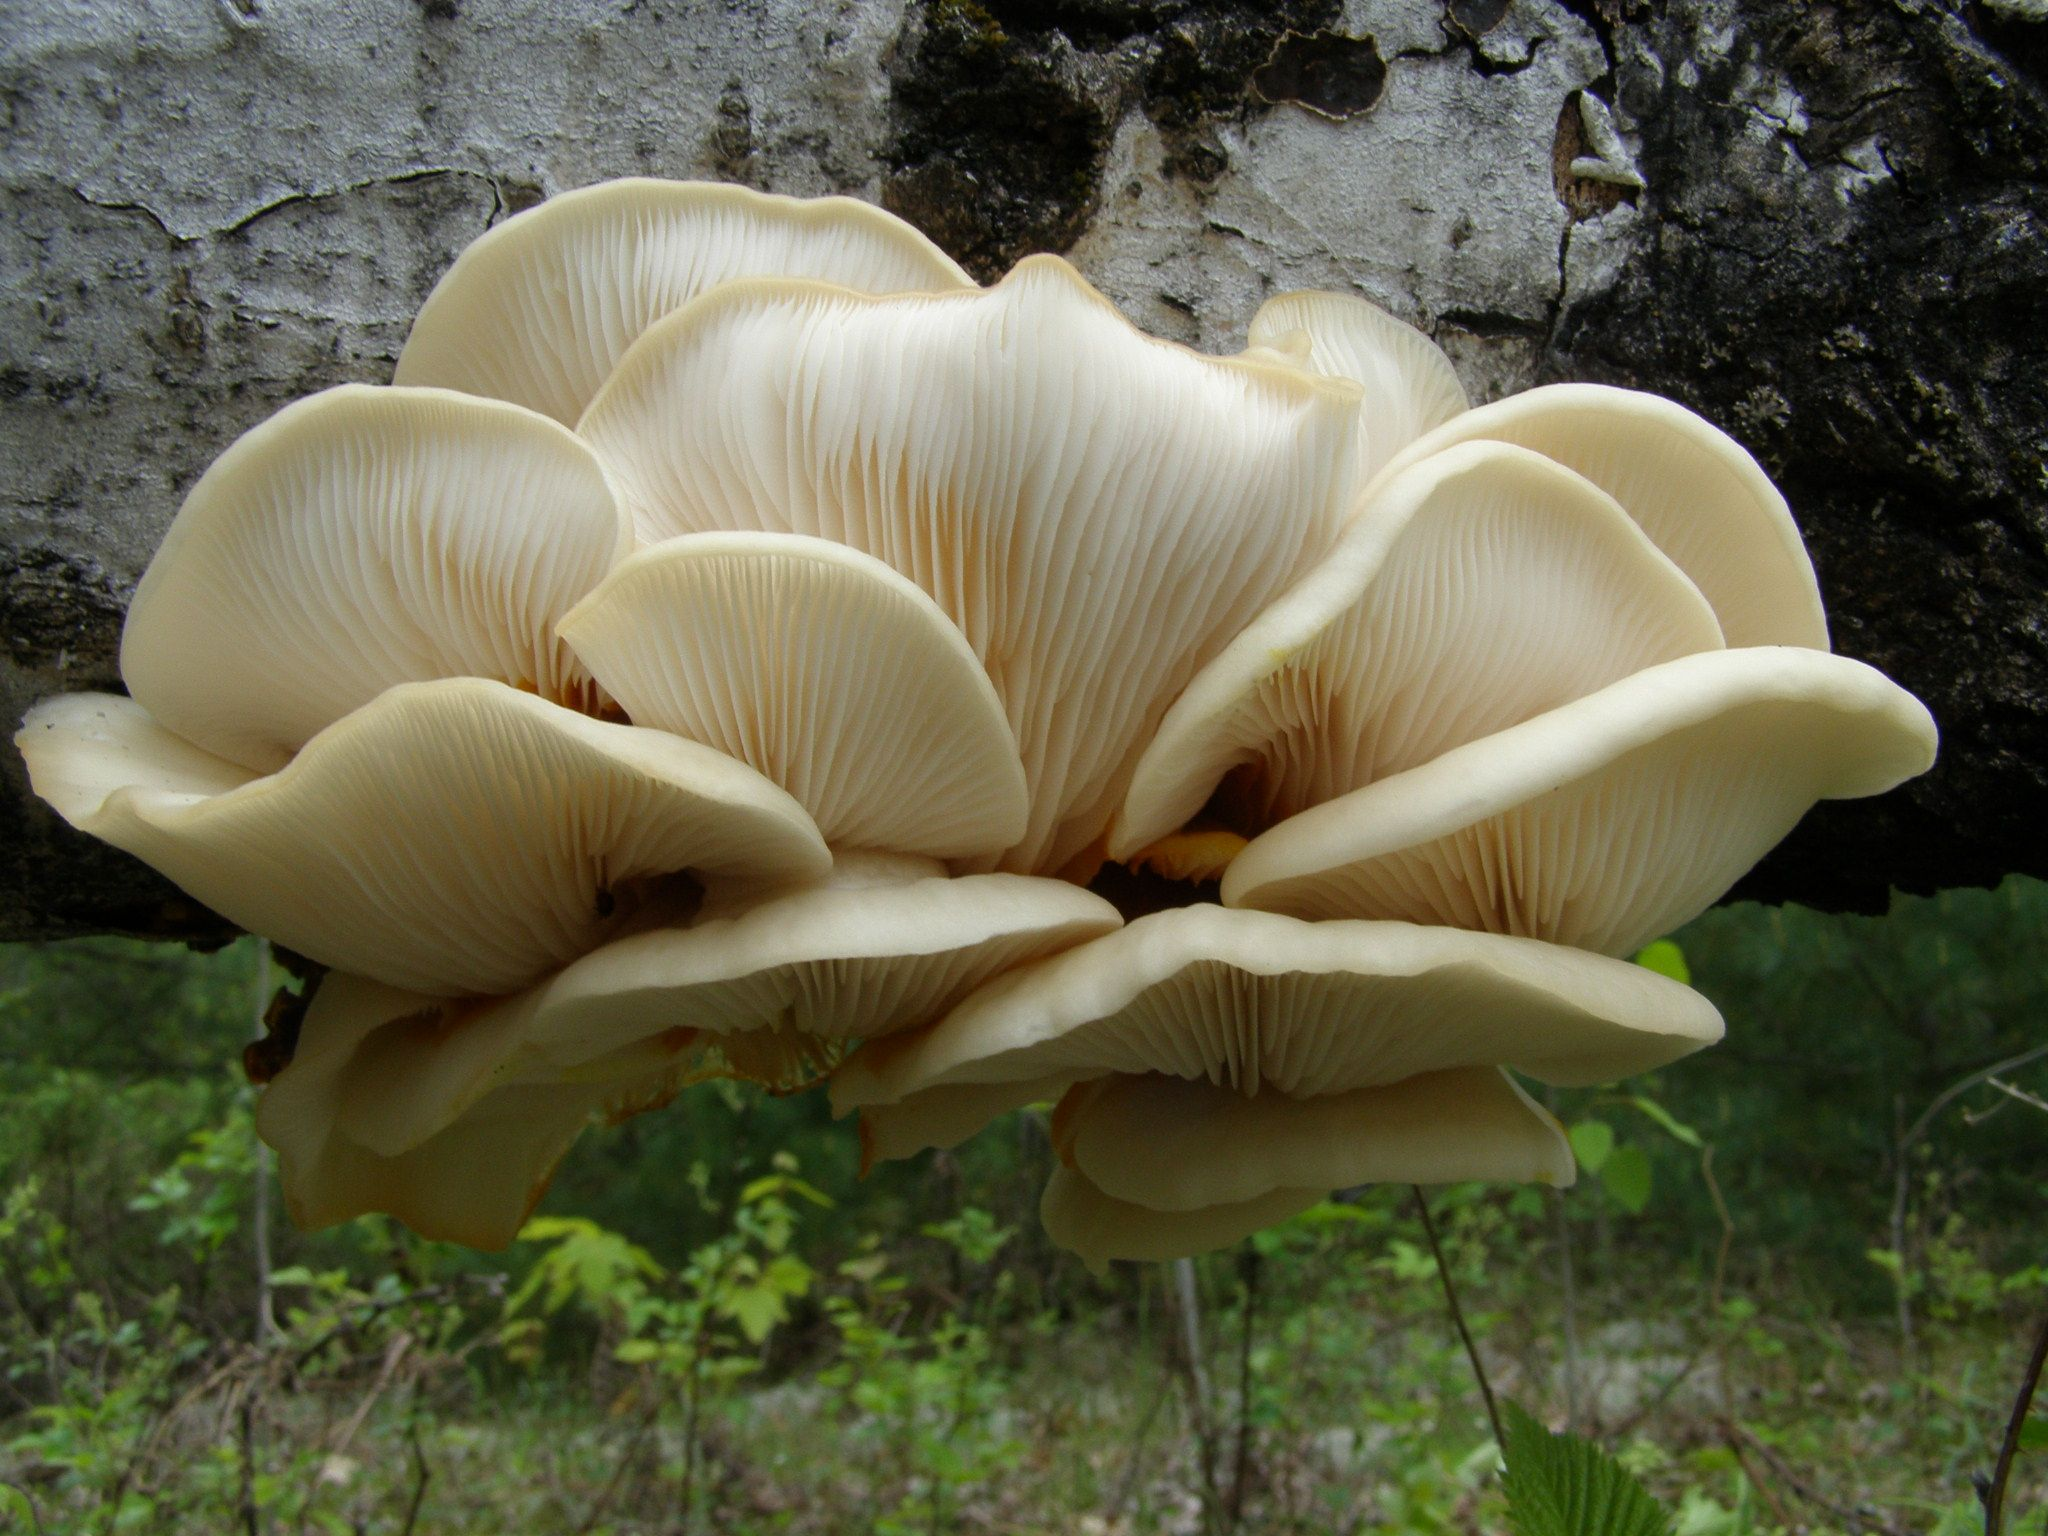 Pleurotus populinus ?, par Rénald Ferland